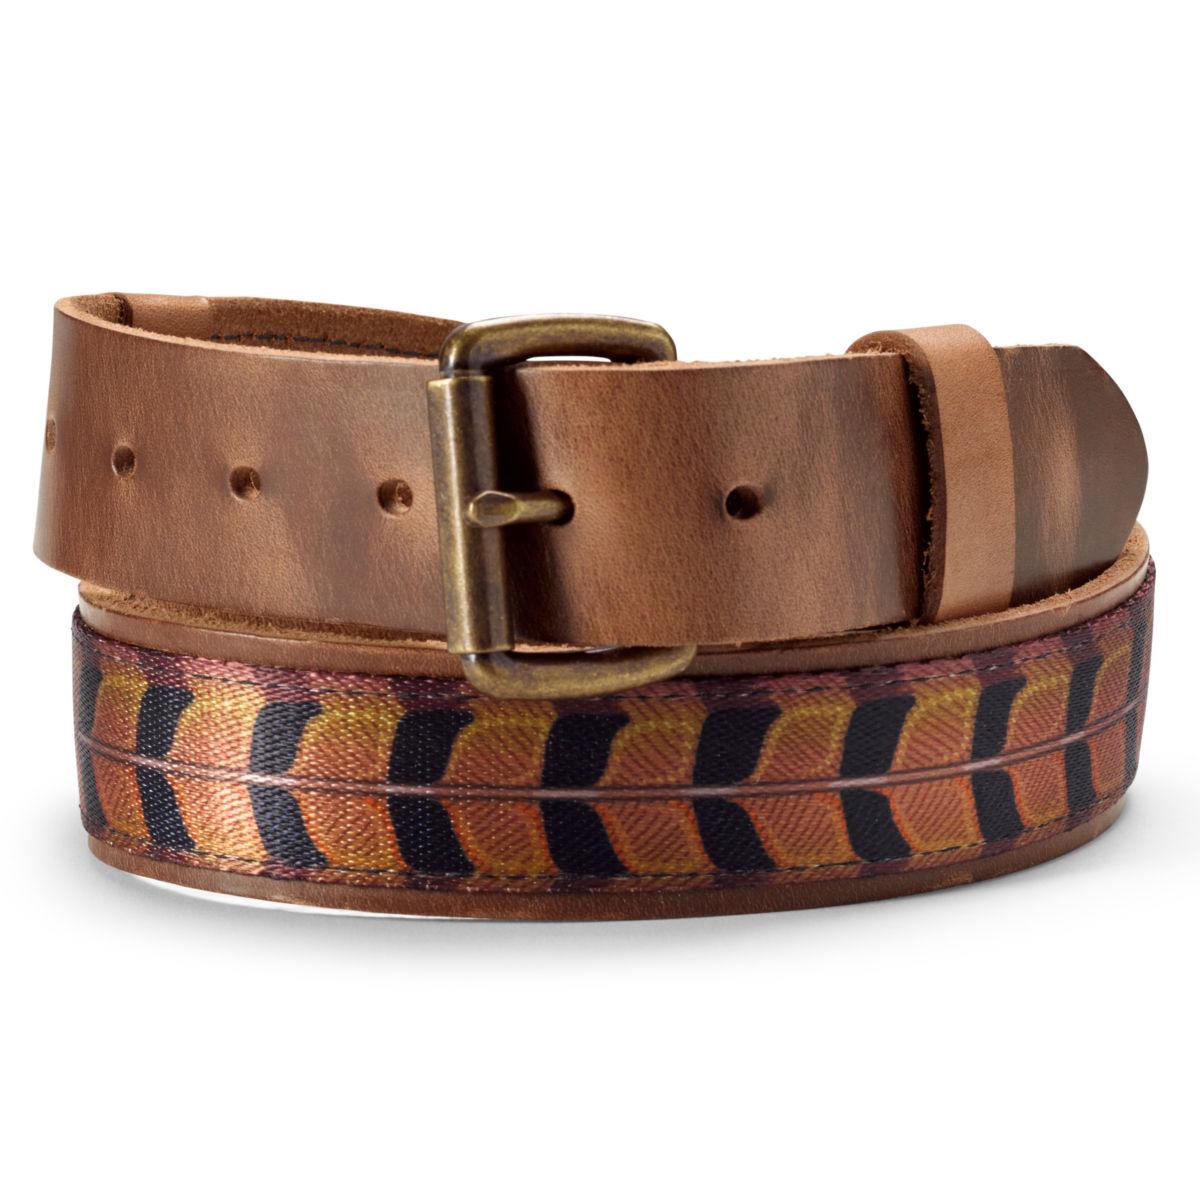 Leather Upland Print Belt - PHEASANTimage number 0